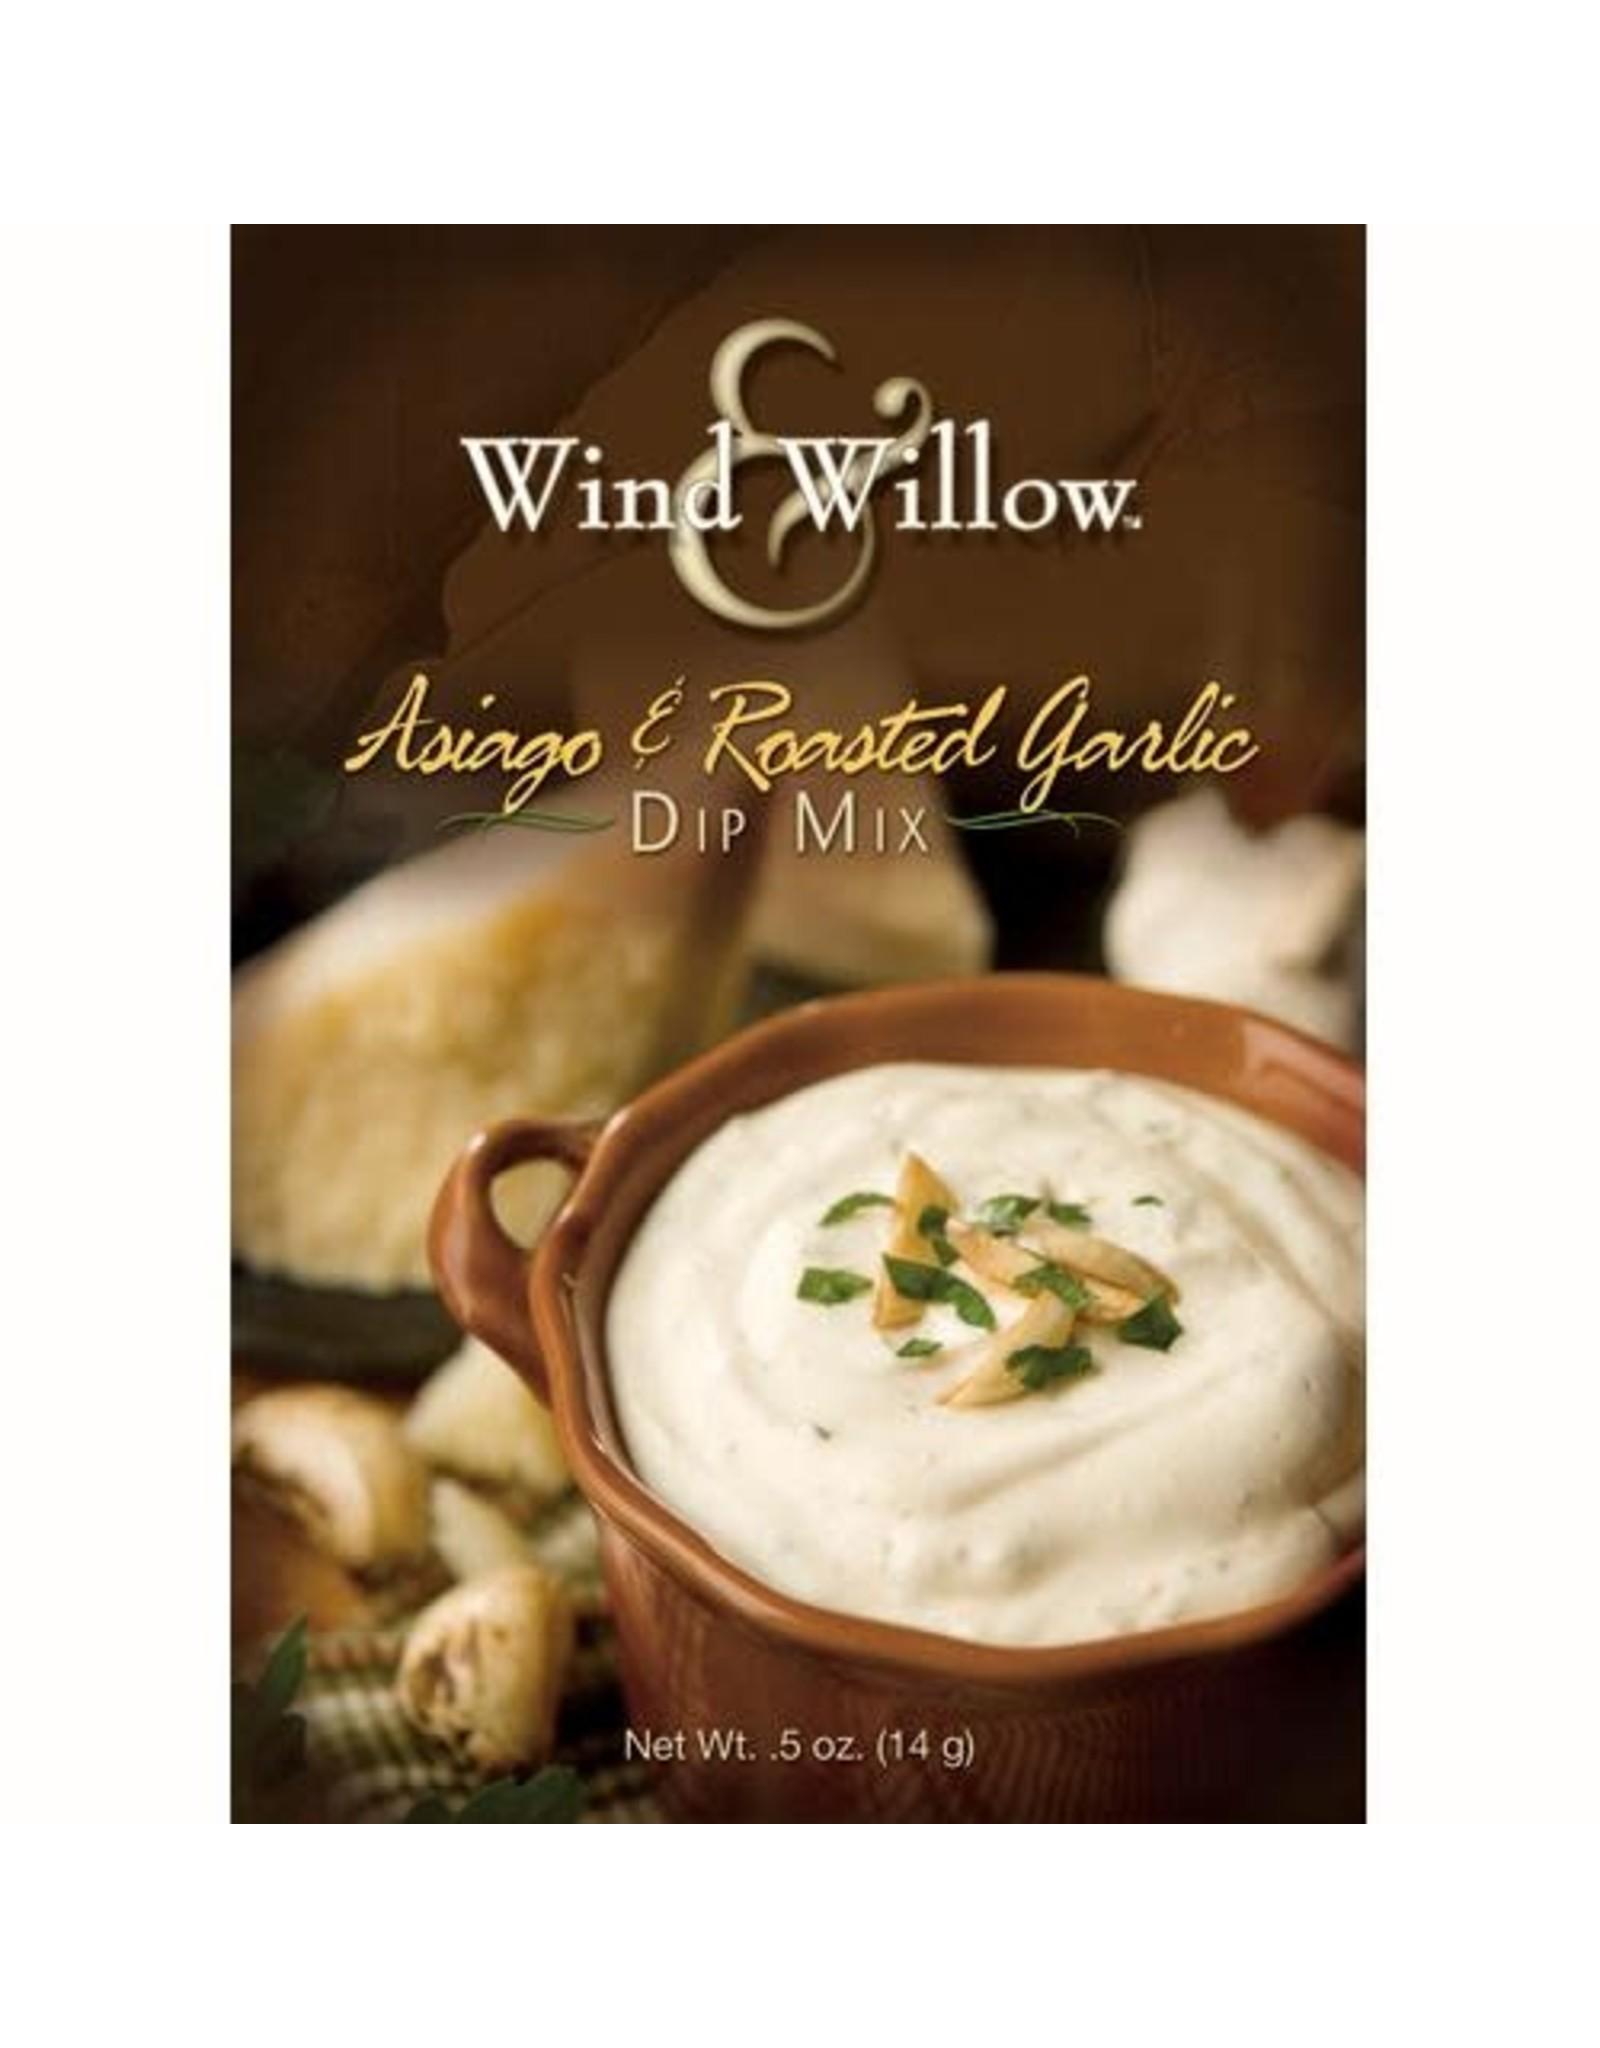 Wind & Willow Asiago & Roasted Garlic Dip Mix, .5 oz